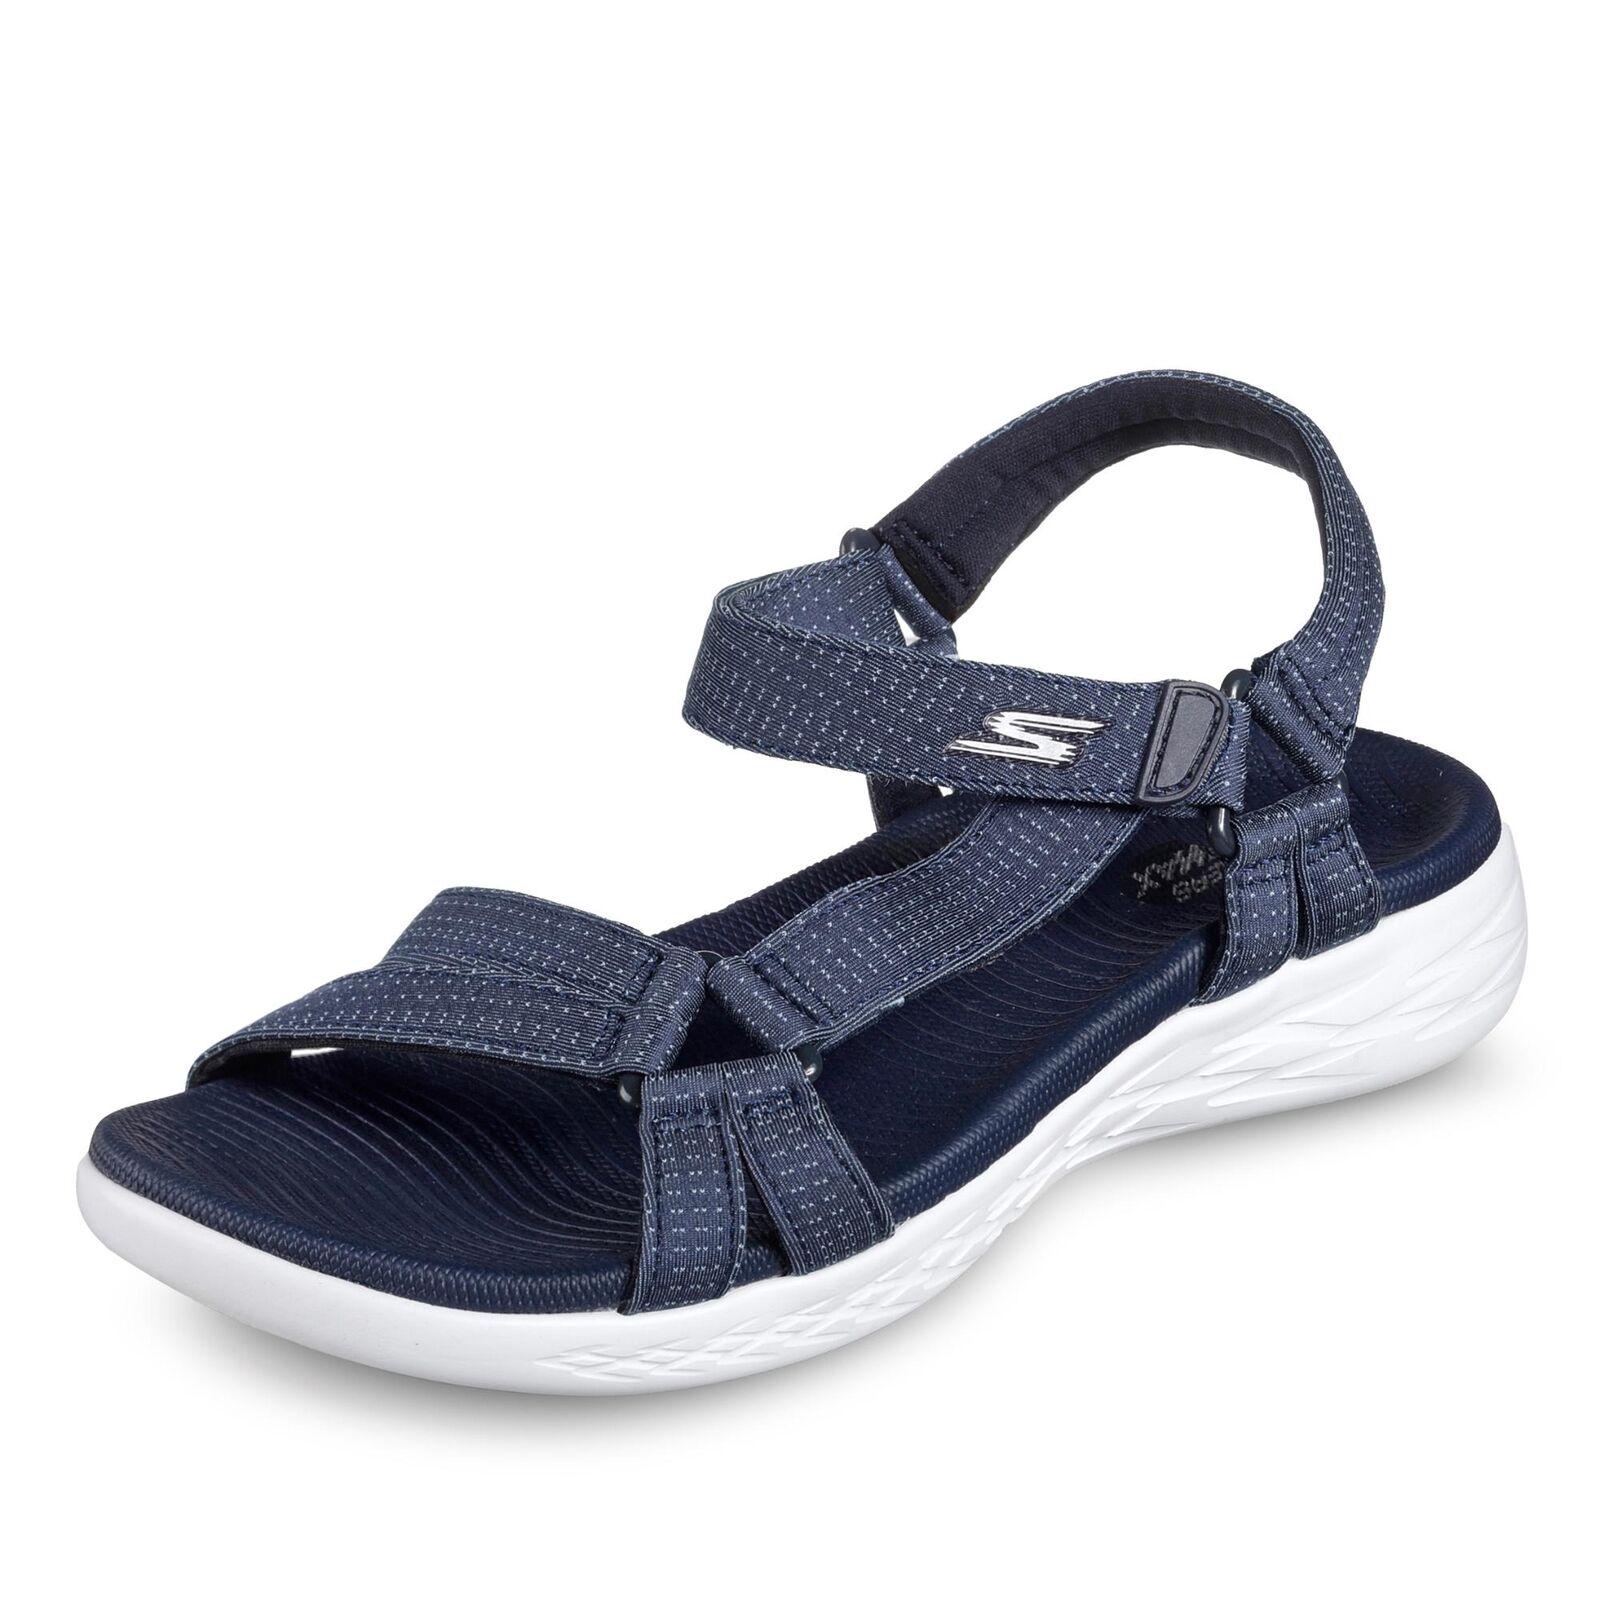 Skechers On The Go 600 Brillancy Sandale dunkelblau